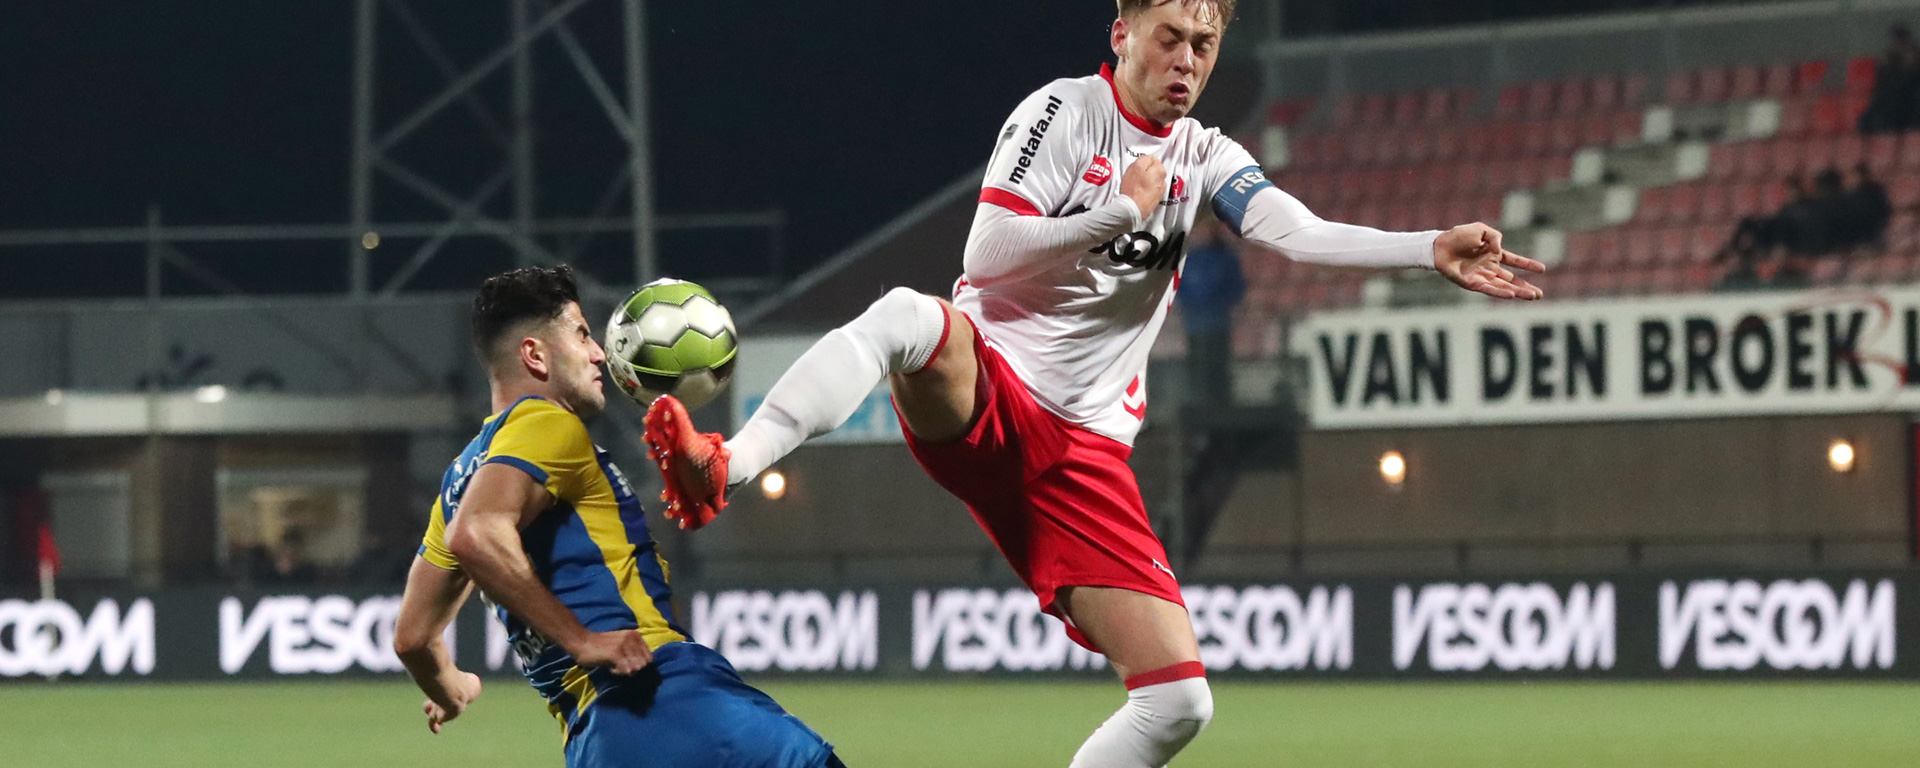 Mister Nelson is wedstrijdsponsor tegen Helmond Sport